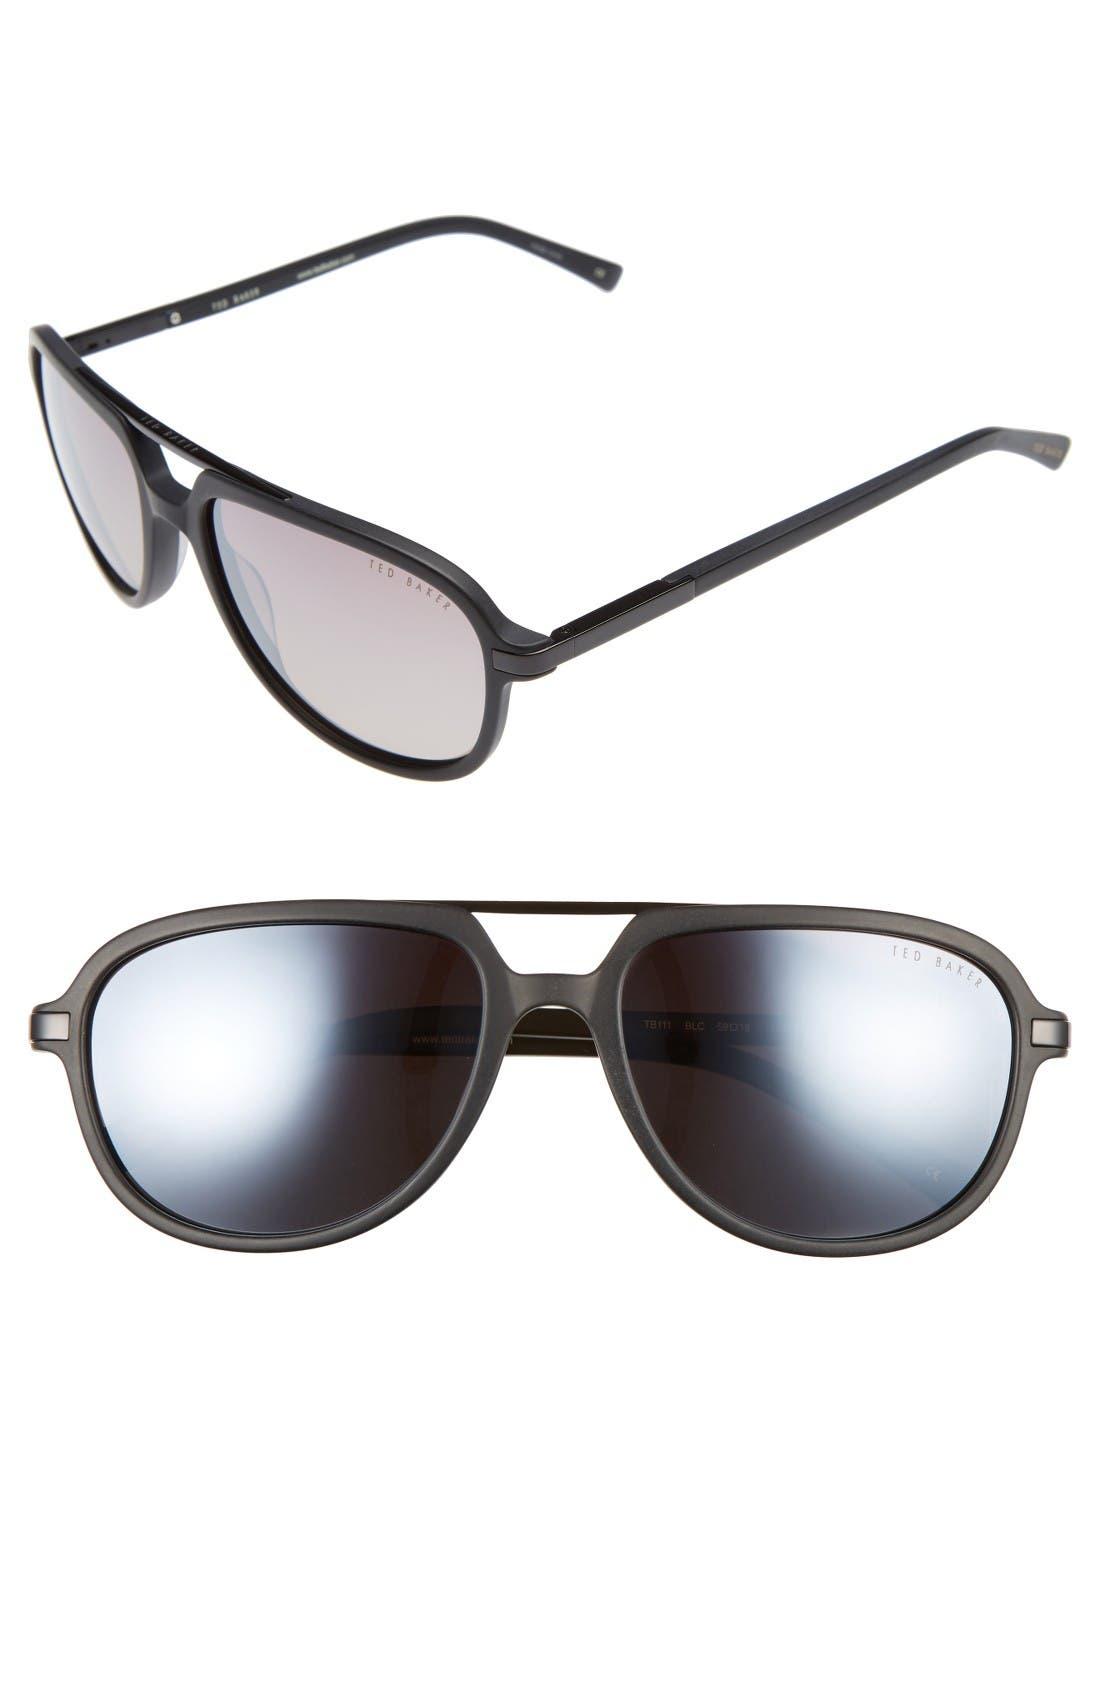 Main Image - Ted Baker London 59mm Polarized Aviator Sunglasses